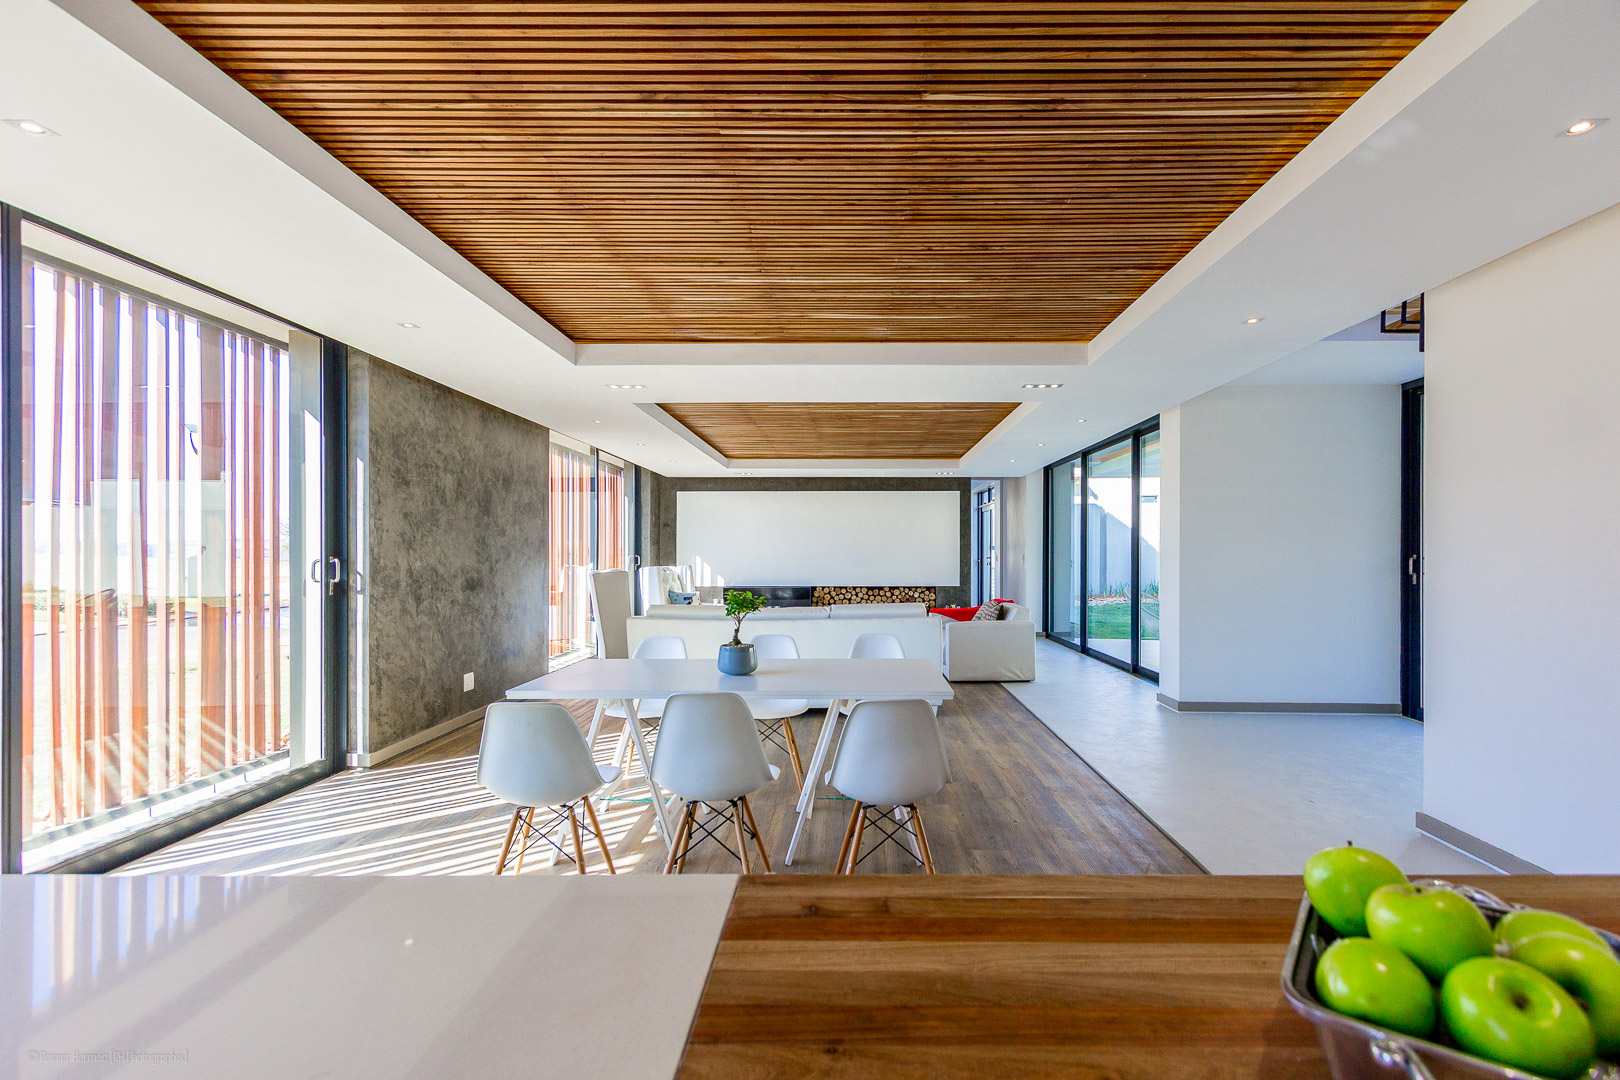 RHPX_Portfolio_Avant Garde Farmhouse Interior-3